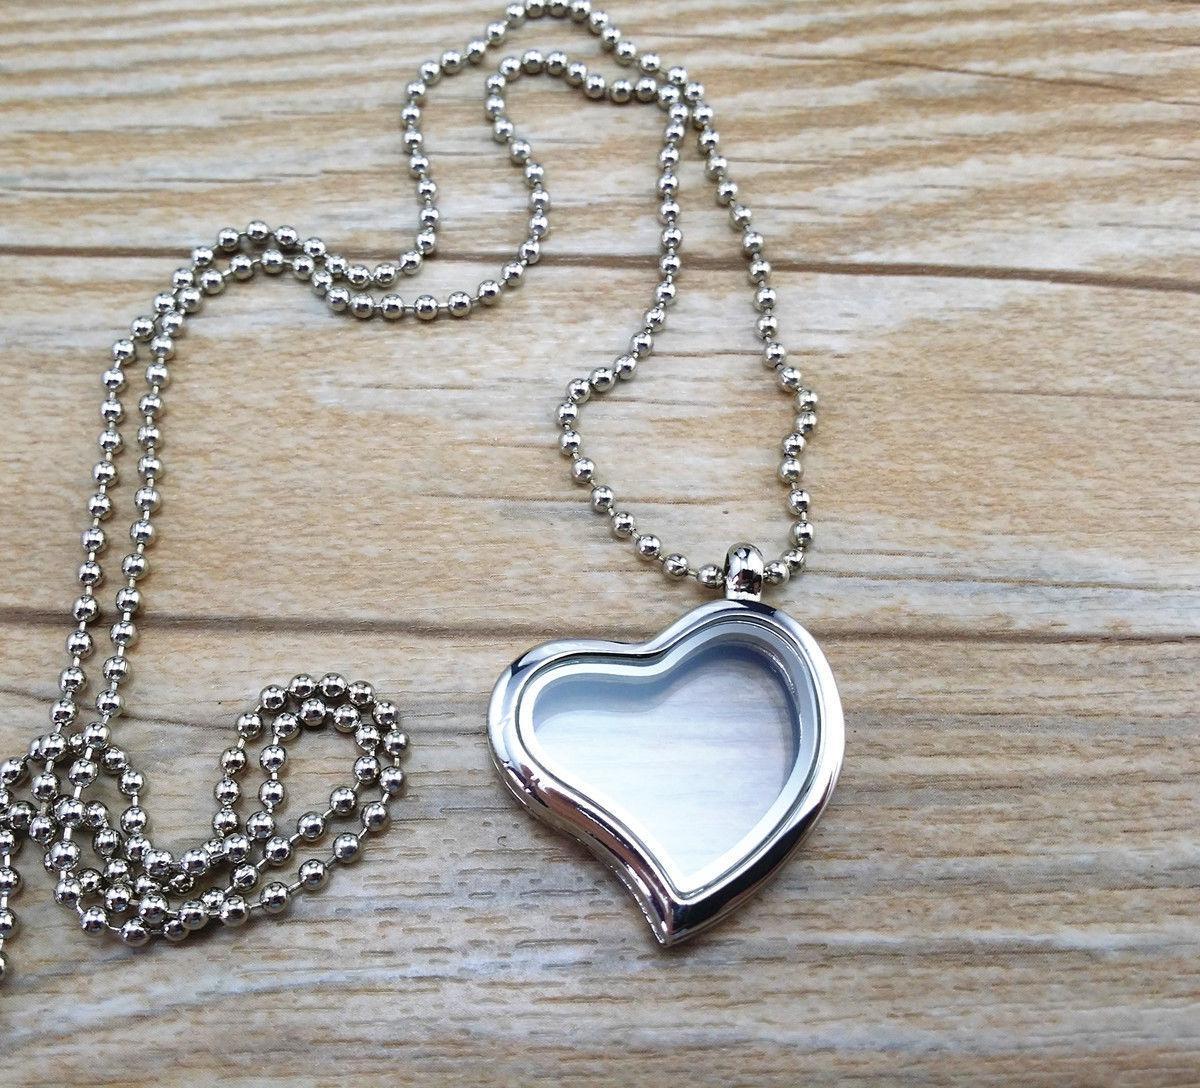 8 Arten 30mm Living Memory Floating Glas Runde Herz Medaillon Anhänger Halsketten Anhänger Modeschmuck Heißer Verkauf